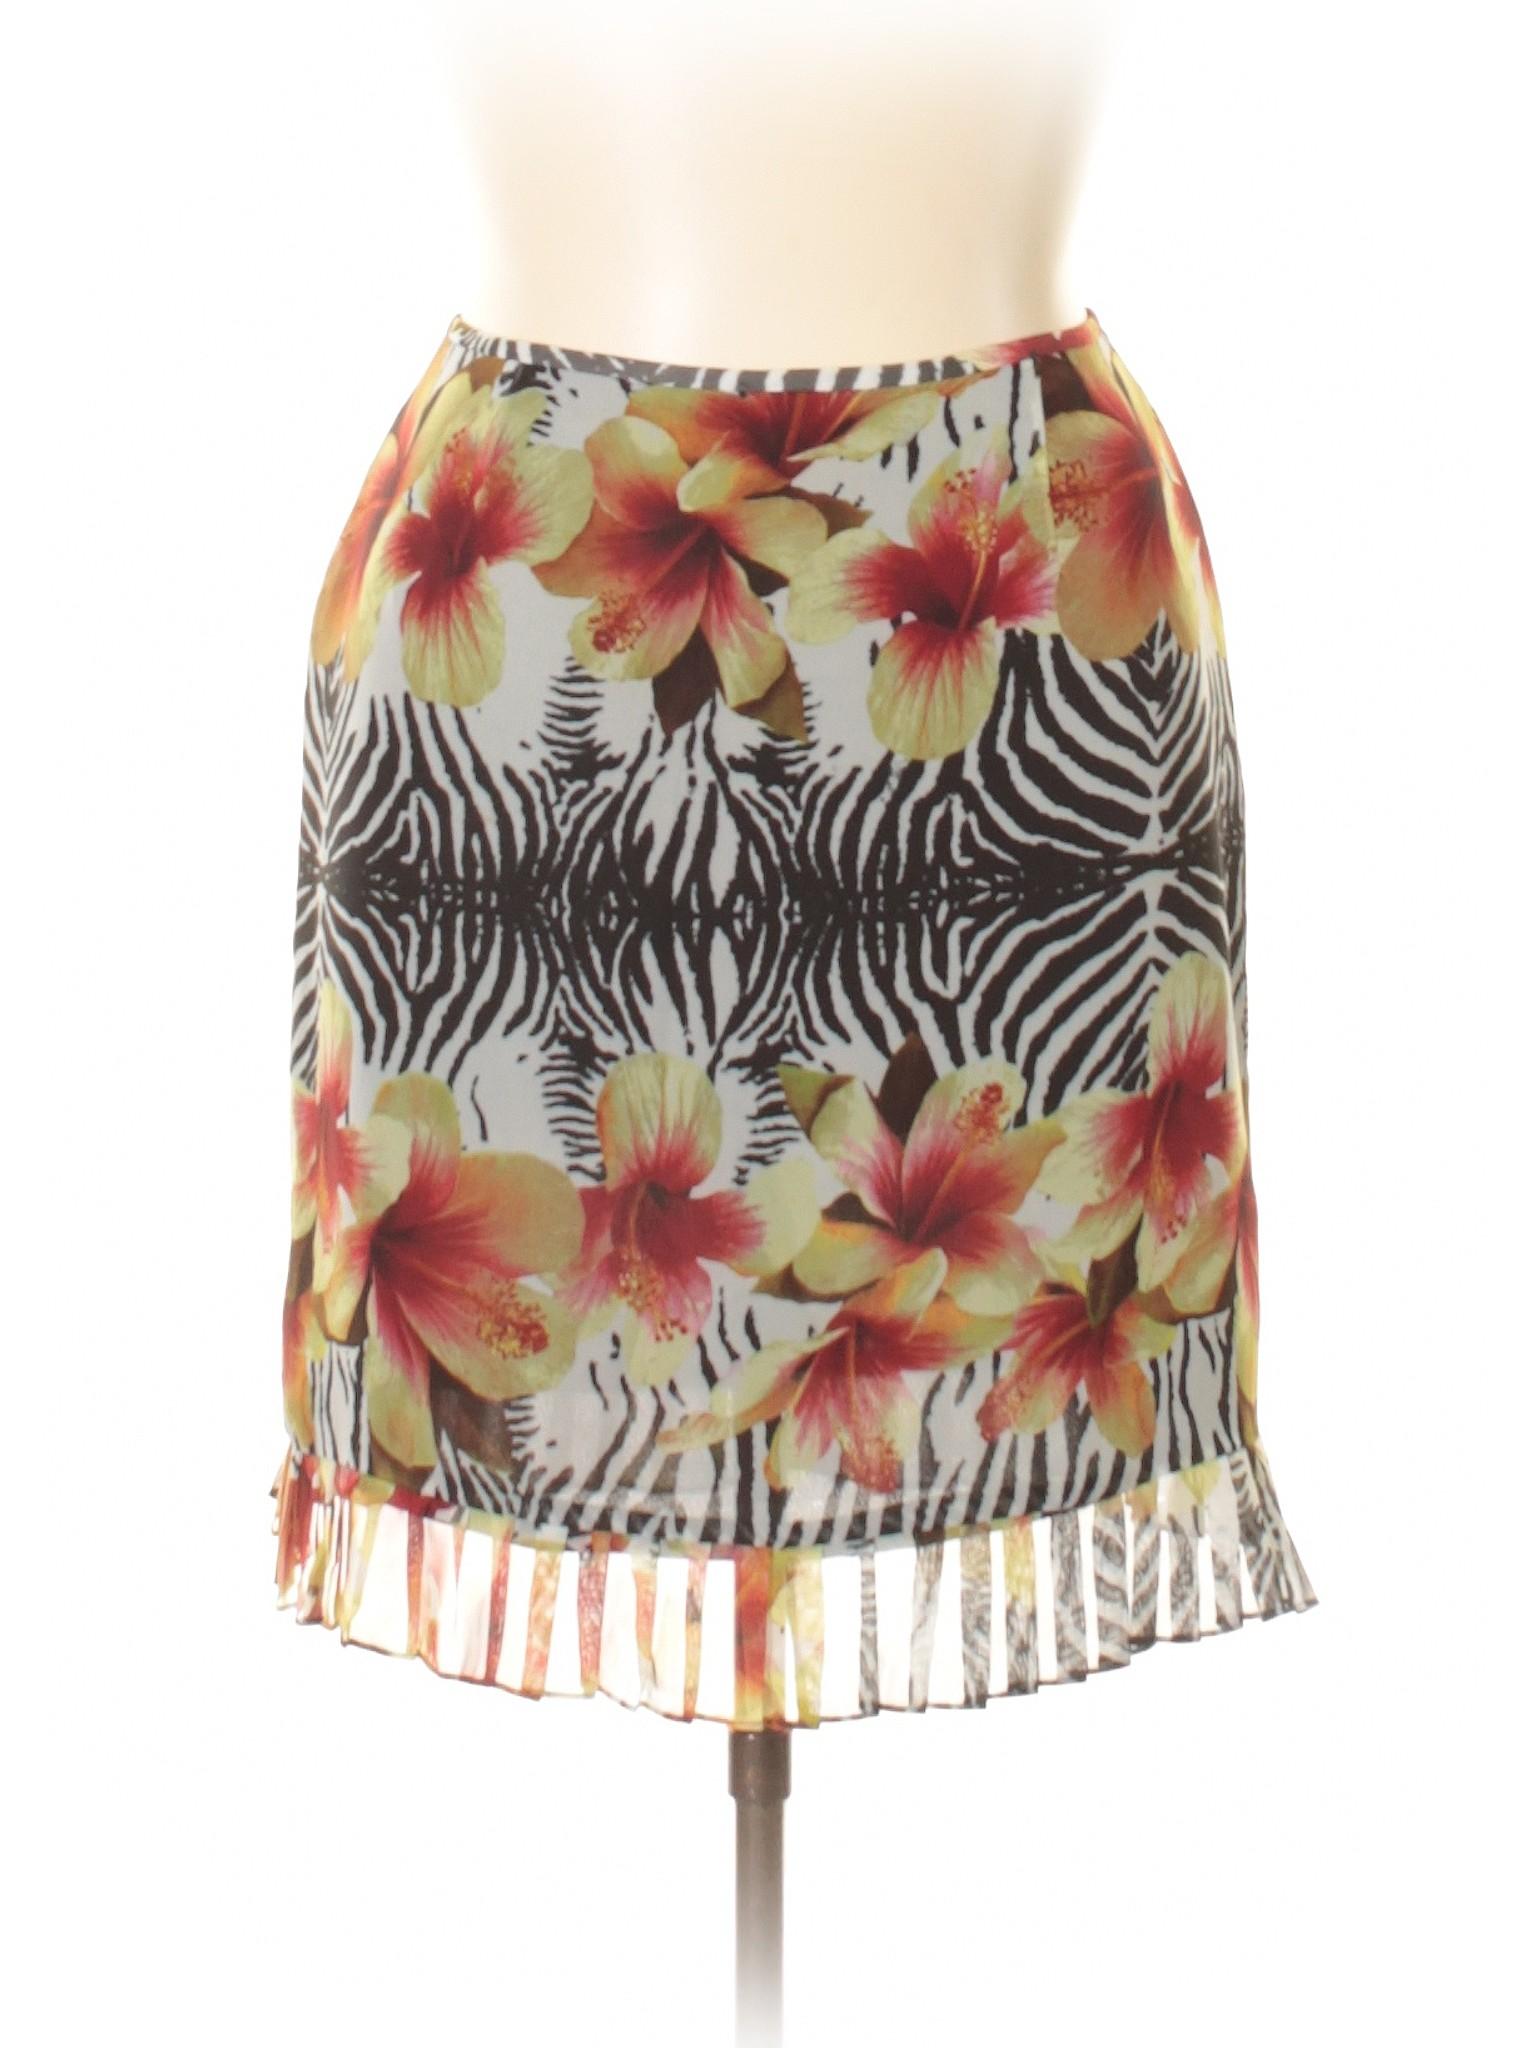 Casual Boutique Skirt Casual Boutique Casual Skirt Casual Skirt Boutique Skirt Boutique w11qI0B